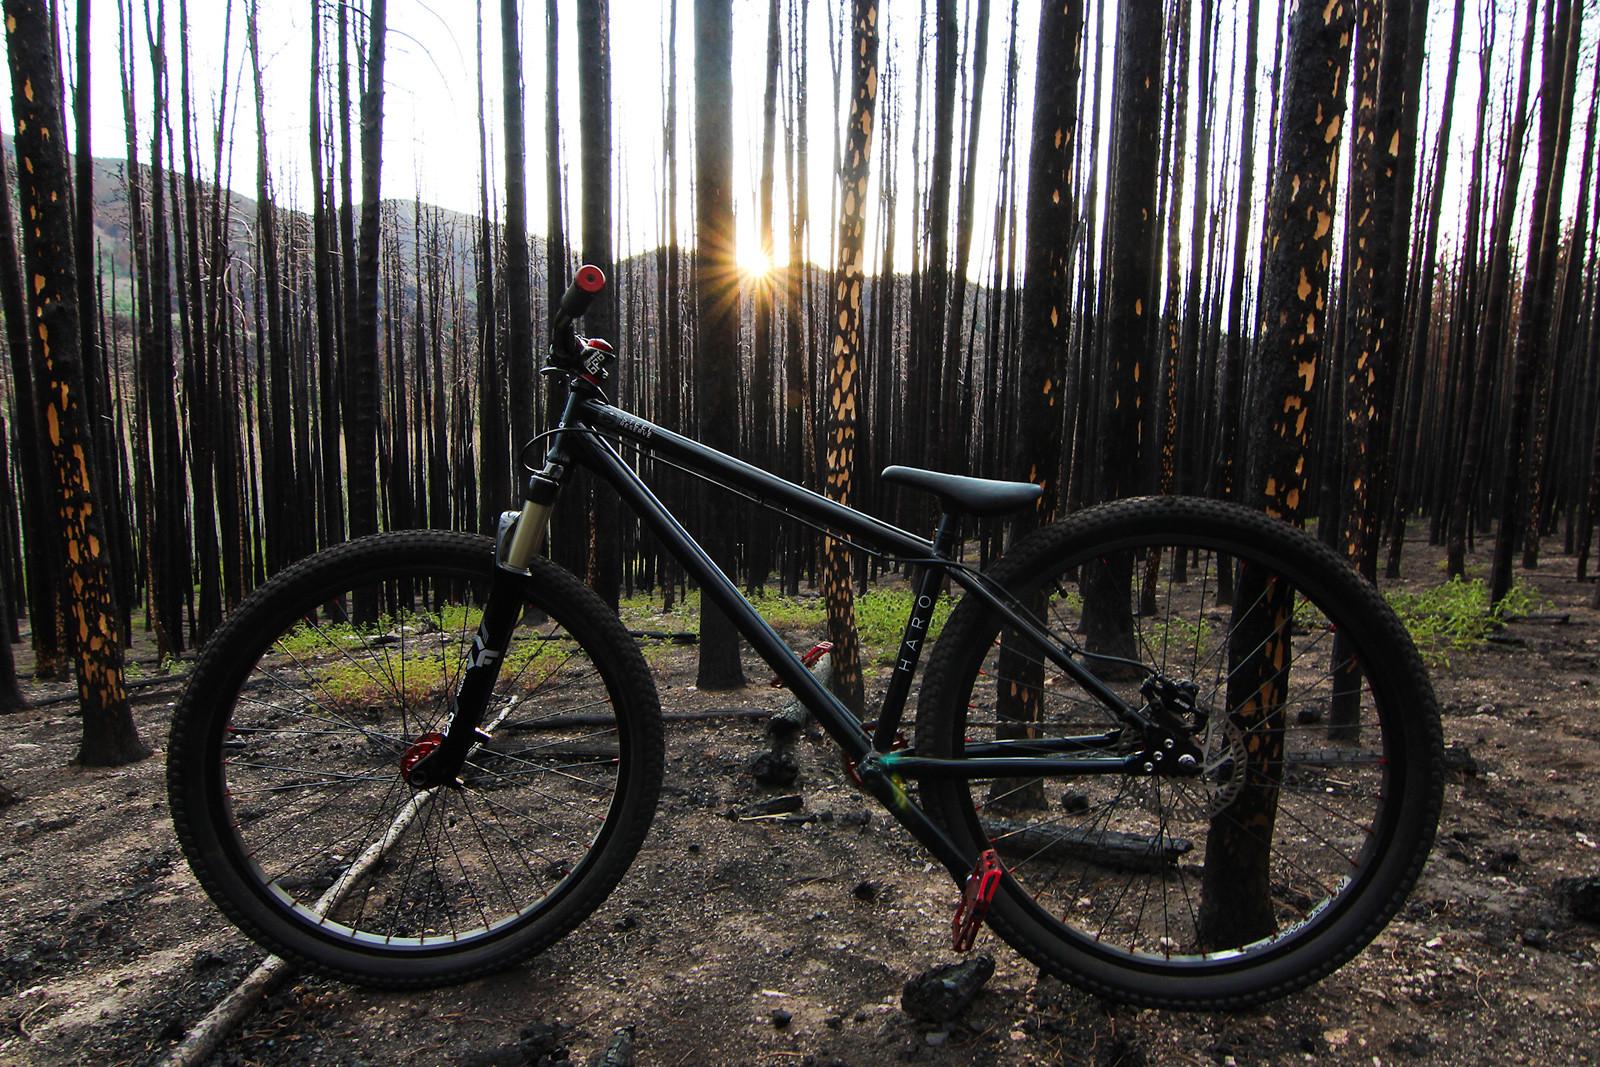 2014 Haro Steel Reserve 1.3 - iceman2058 - Mountain Biking Pictures - Vital MTB